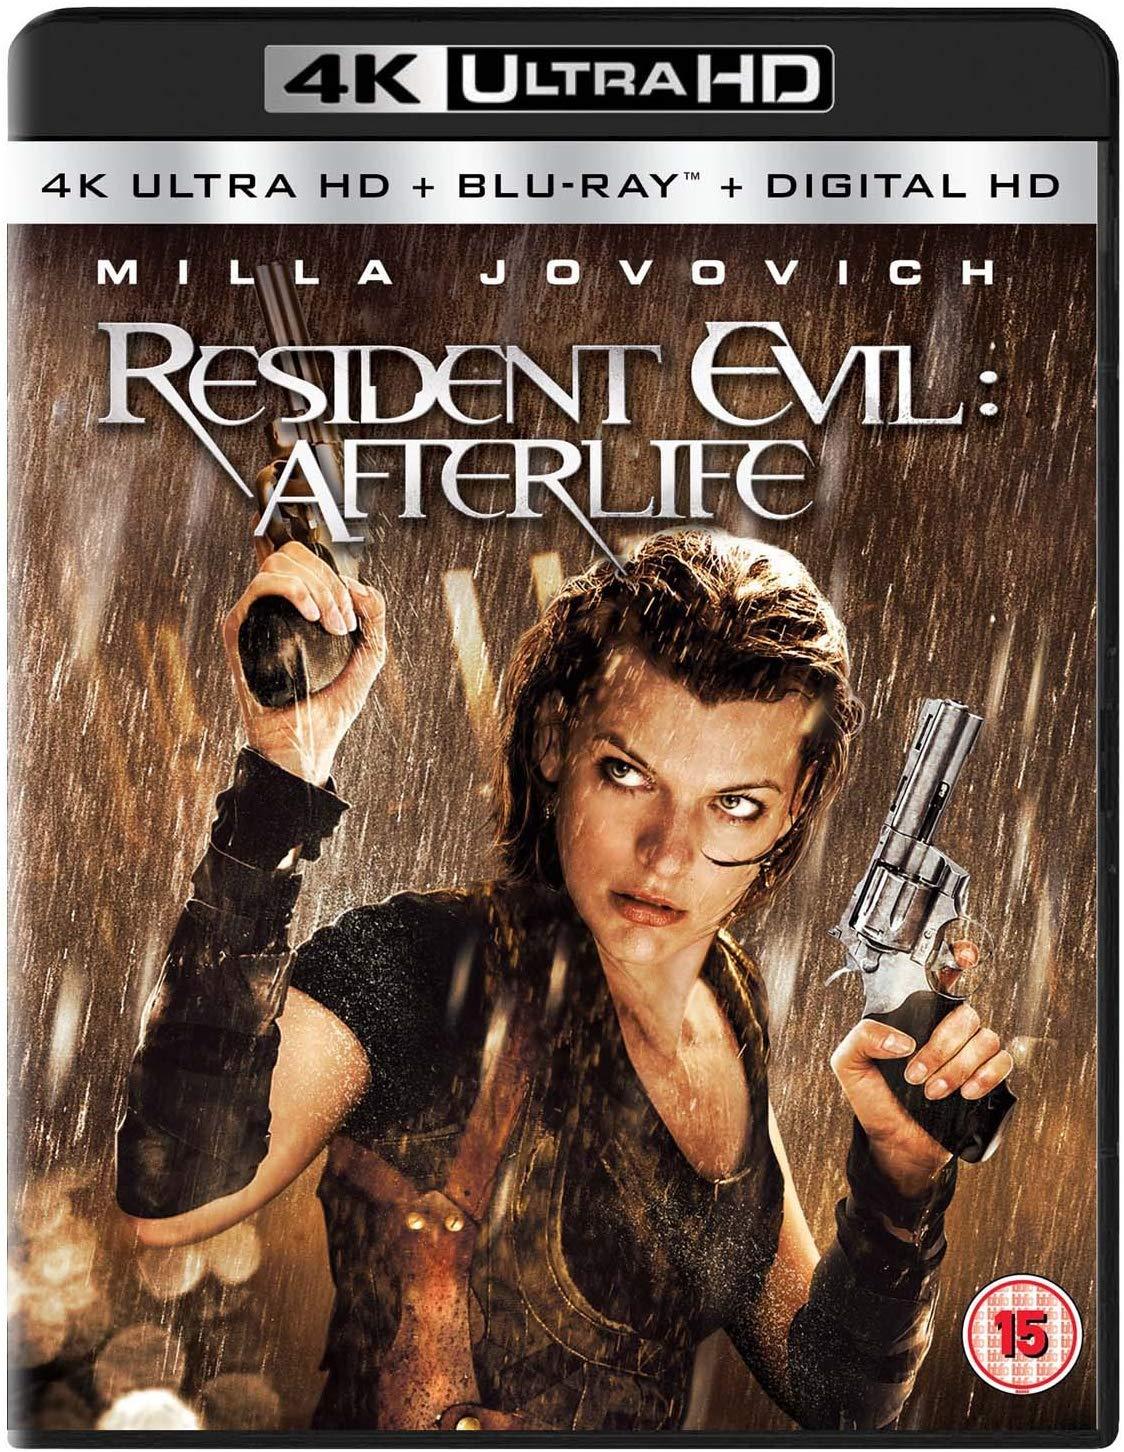 Resident Evil: Afterlife (4K Ultra HD [2010] [Region Free] 4K + Blu-ray + Digital version £7.99 @ Amazon Prime / £10.98 Non Prime